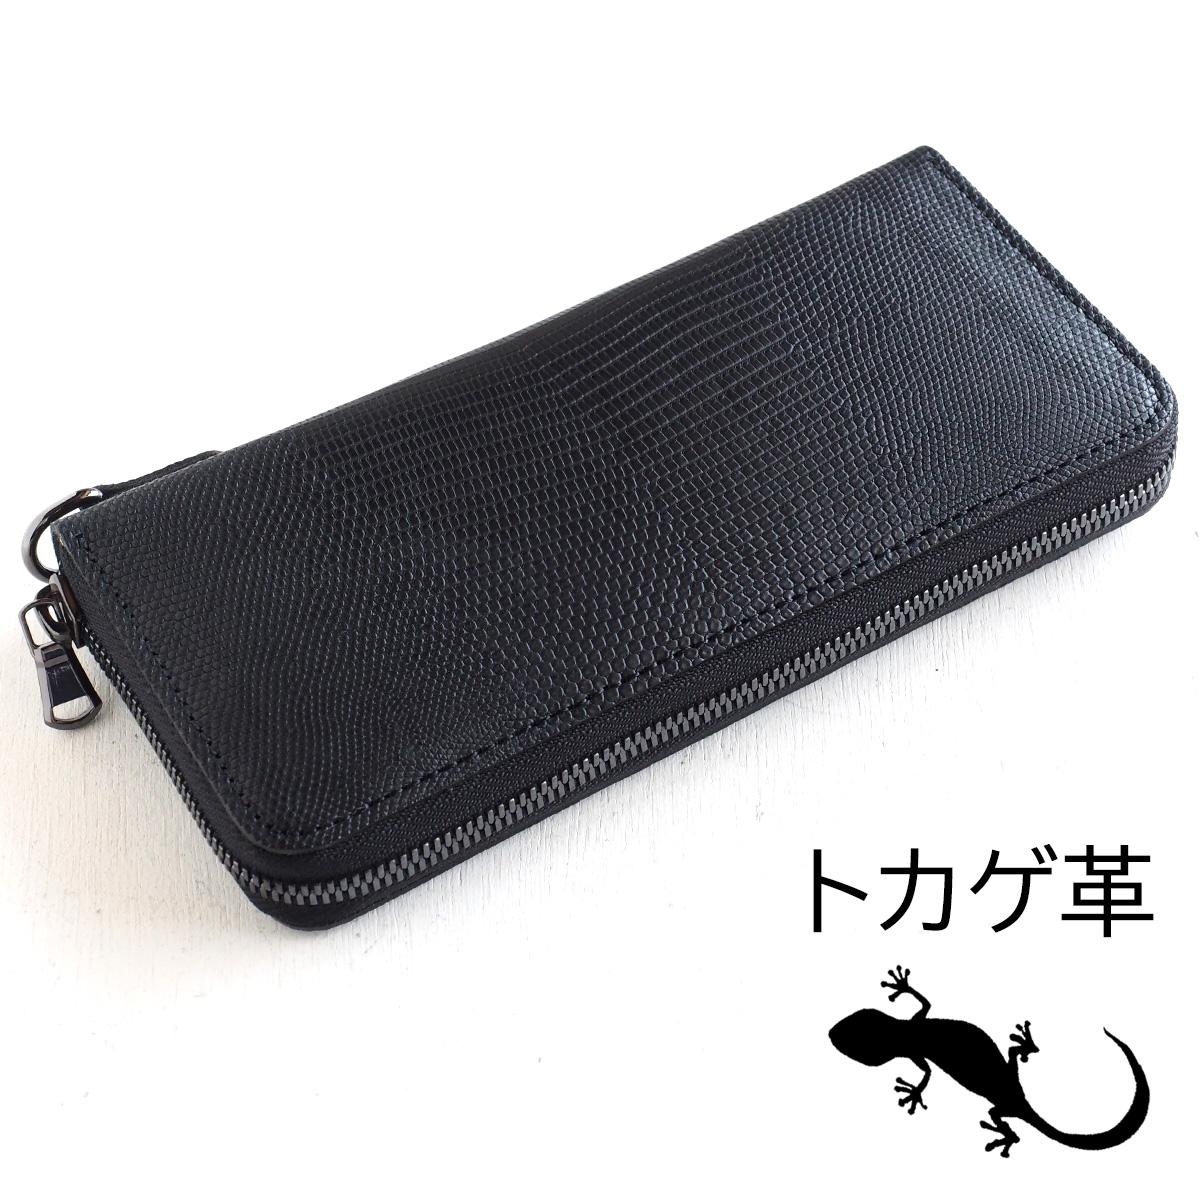 ZOO(ズー) トカゲ革 ピューマウォレット13 ラウンドファスナー 長財布 ブラック [Z-ZLW-062-BK] 革財布 革製品 革小物